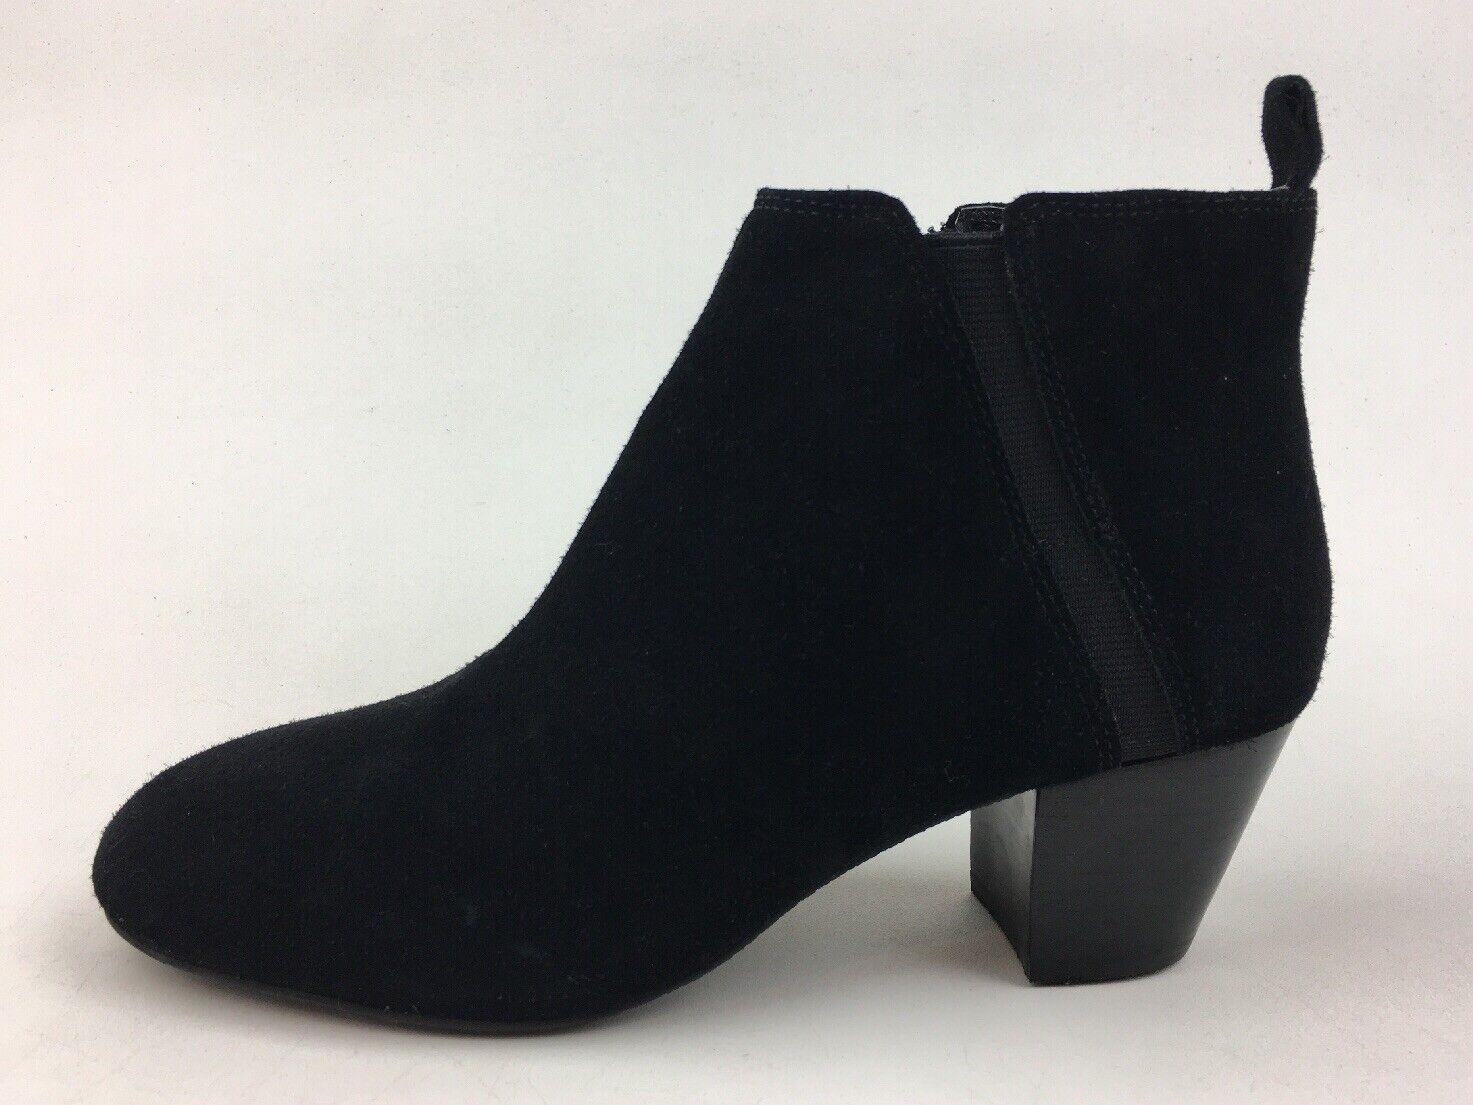 Tesori Chelsea Block Heel Ankle Boots Women's Size 6 M, Black Suede 3233